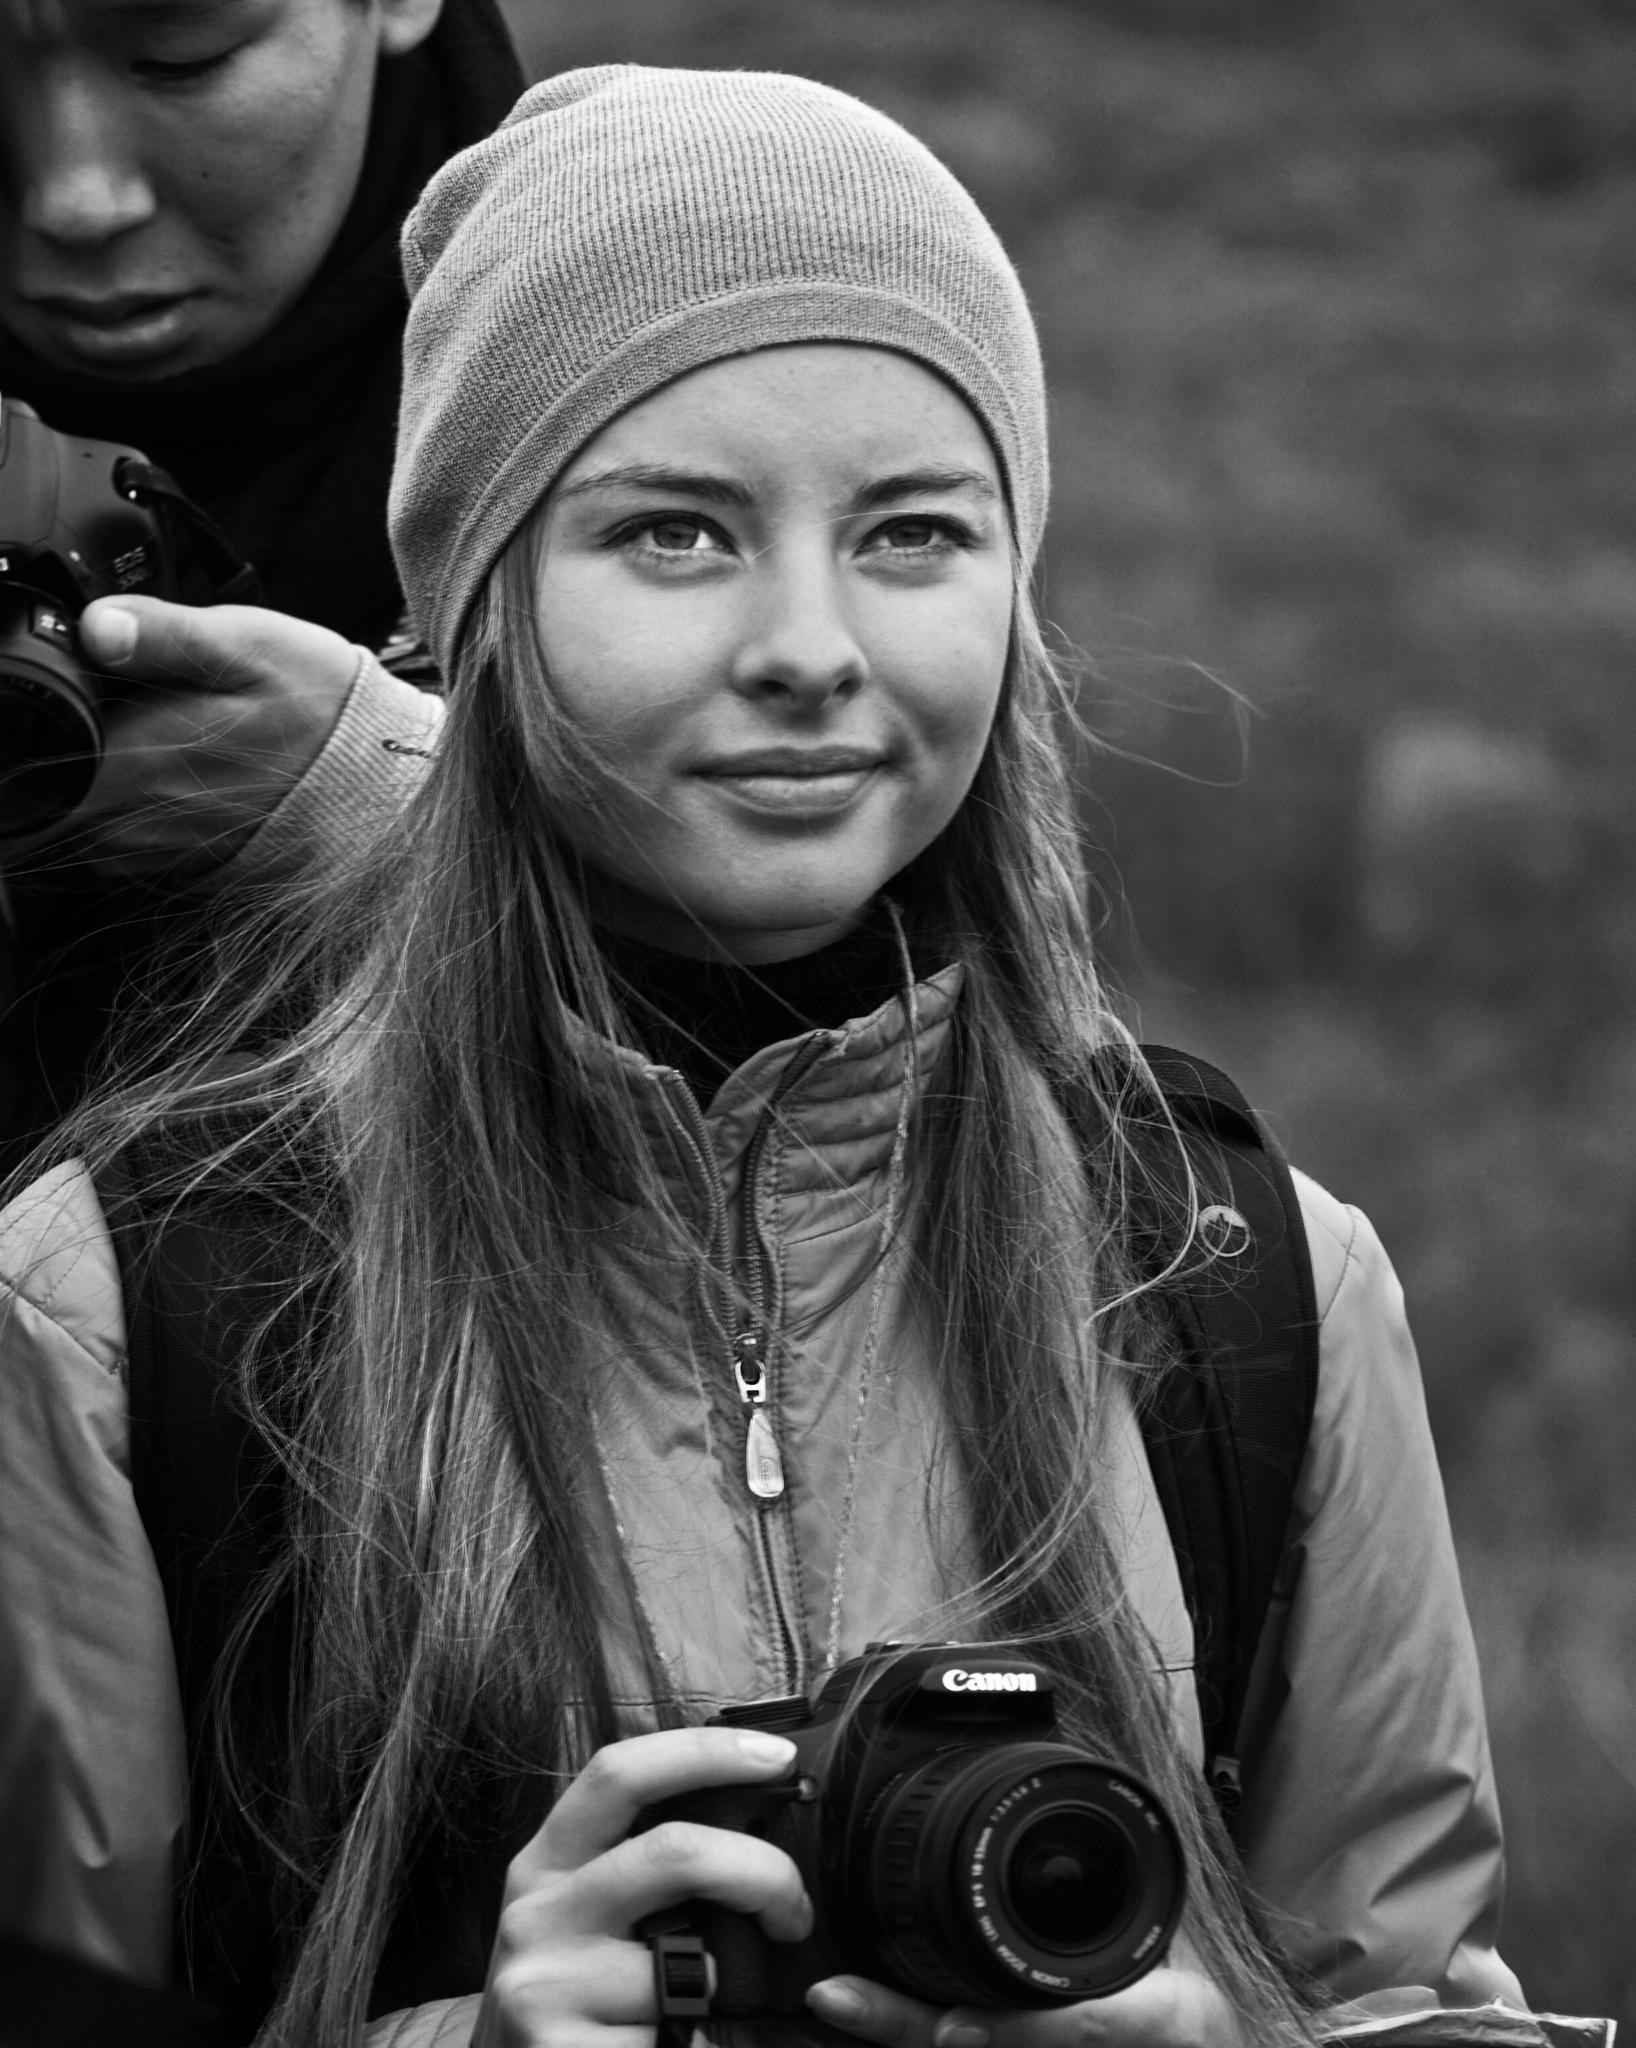 Anna and camera by Сергей Юрьев